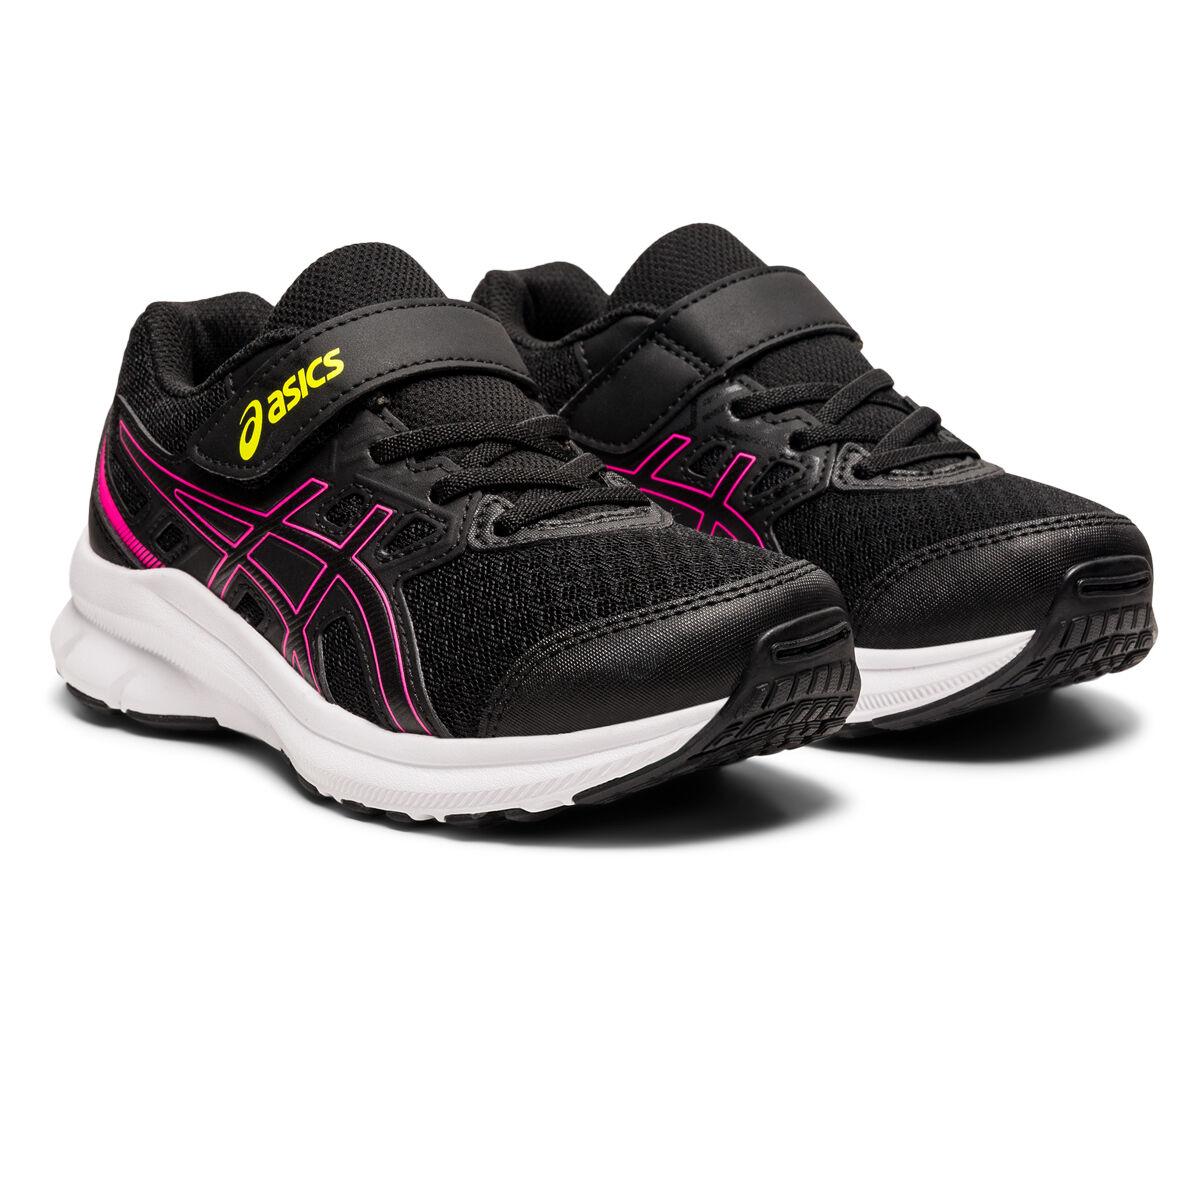 Asics Jolt 3 Kids Running Shoes | Thesommelierchef Sport